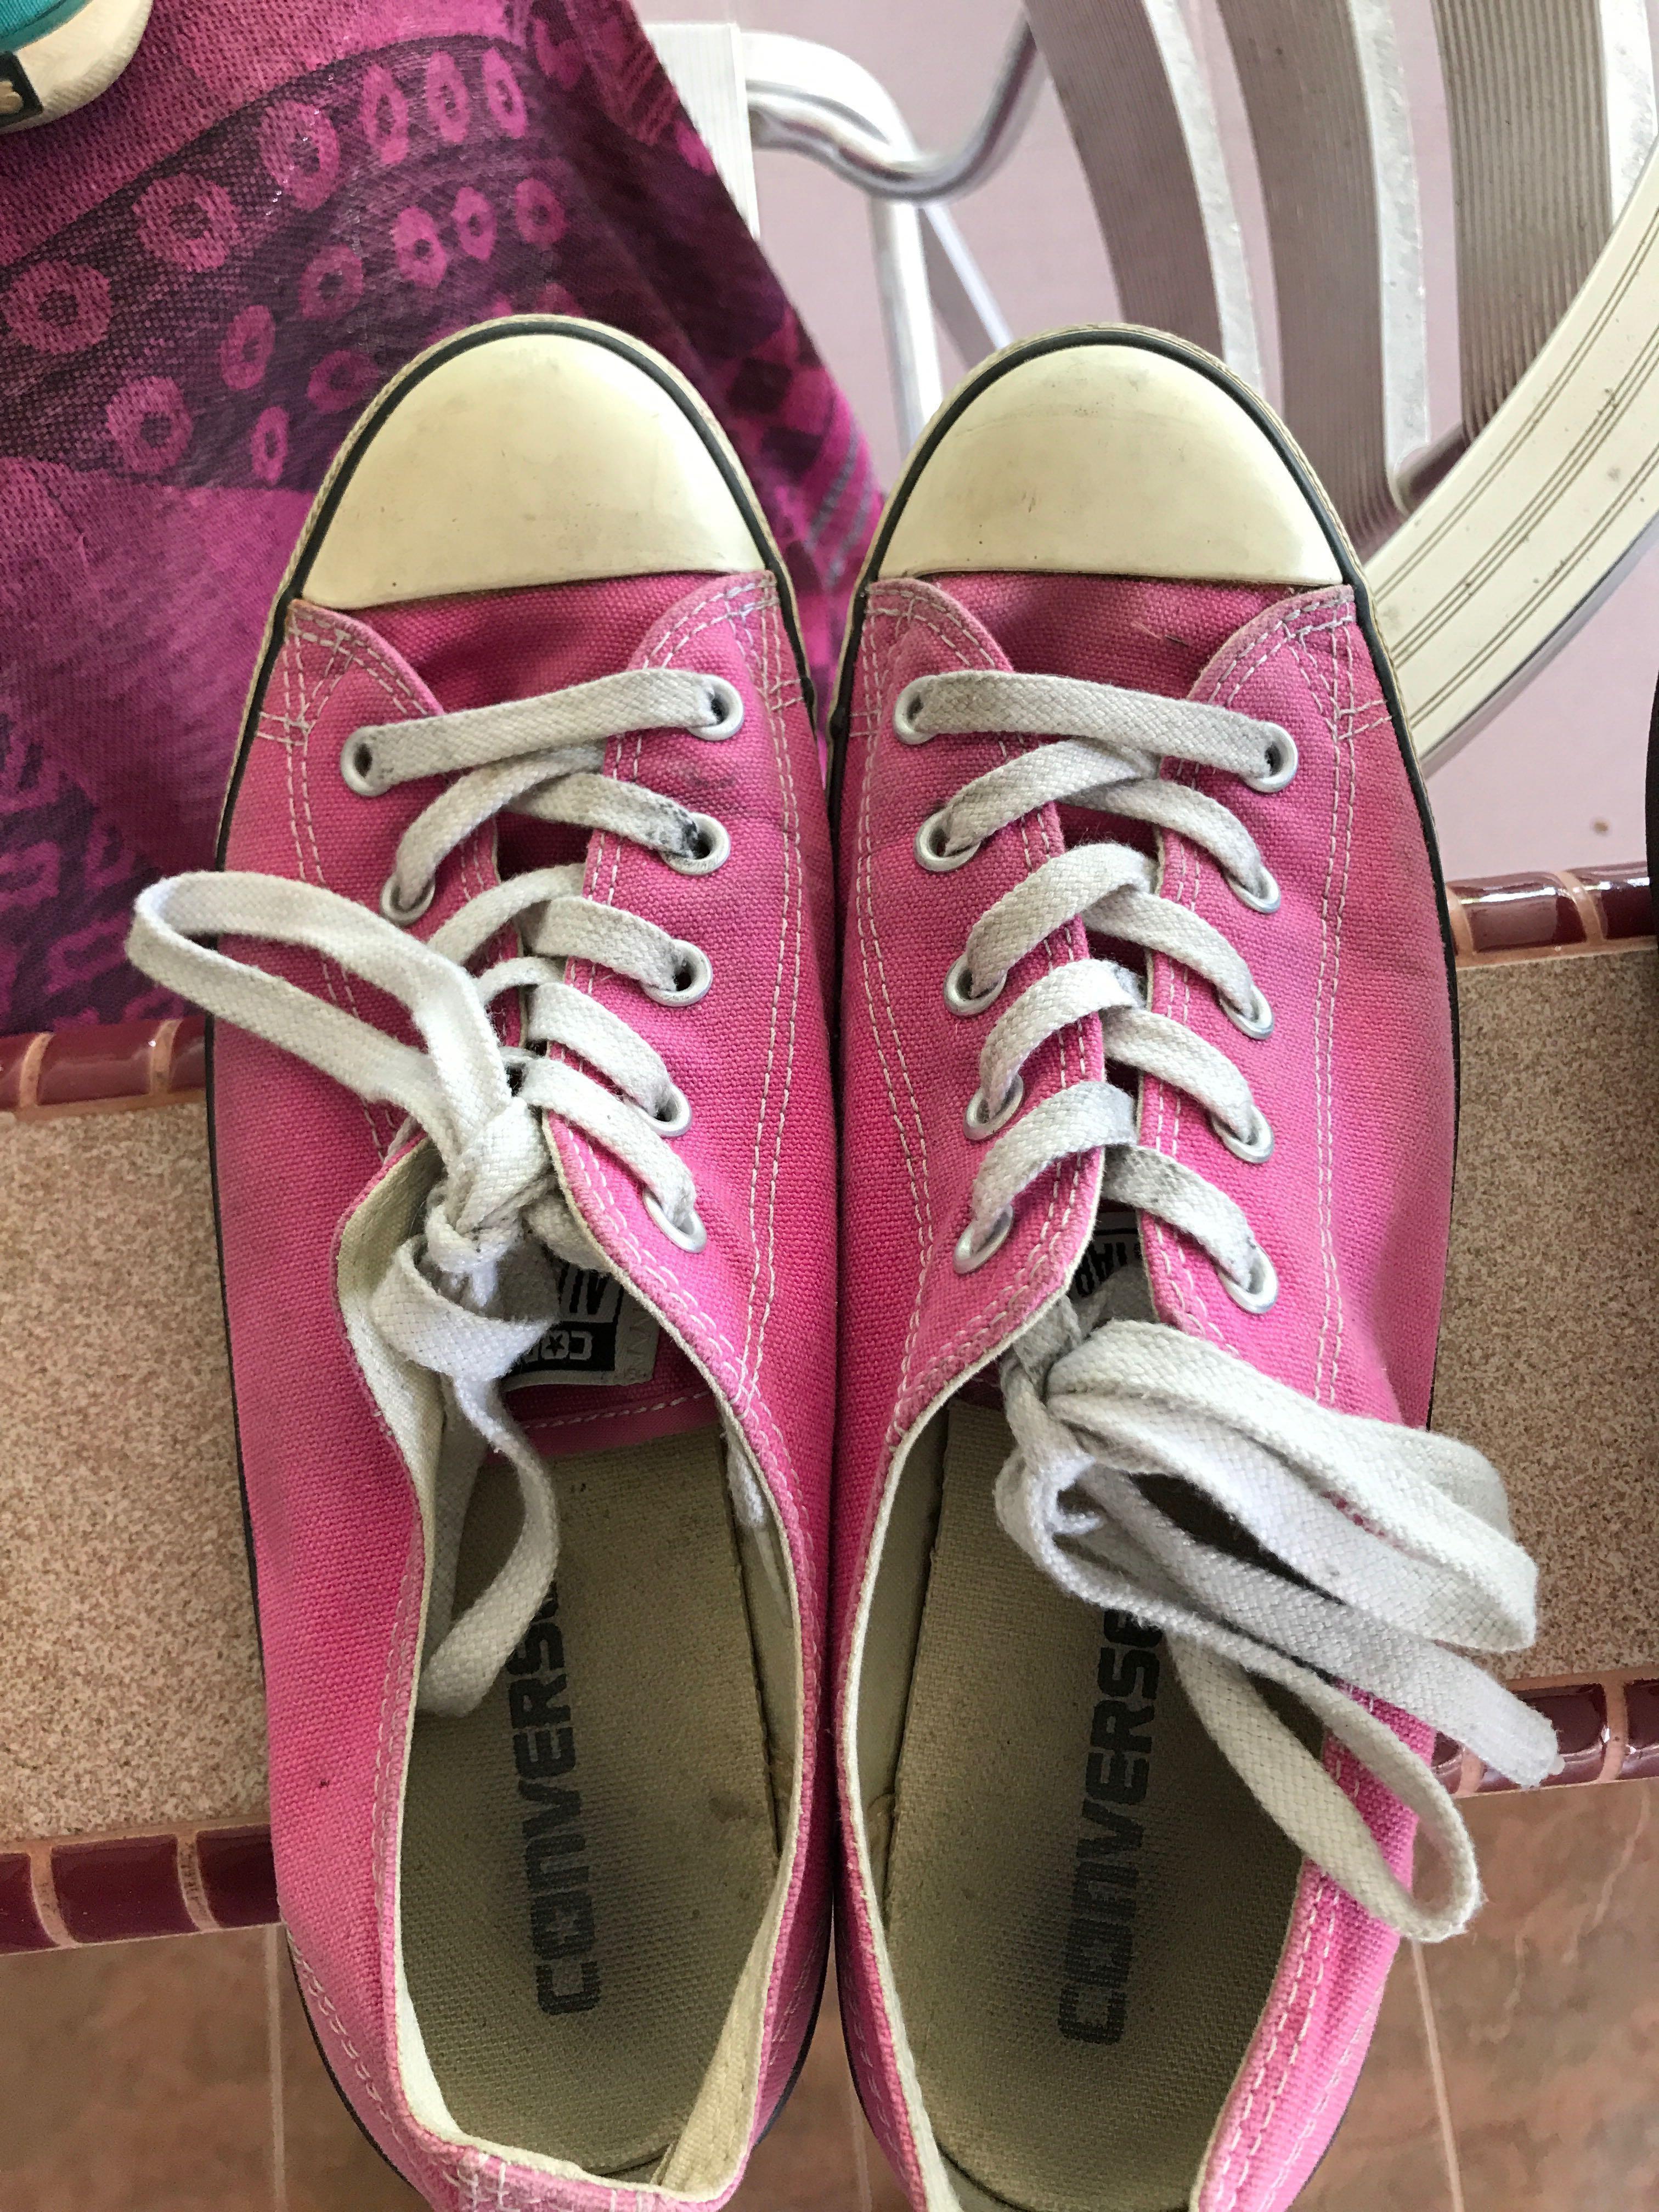 6962f80934c0 Home · Women s Fashion · Shoes. photo photo photo photo